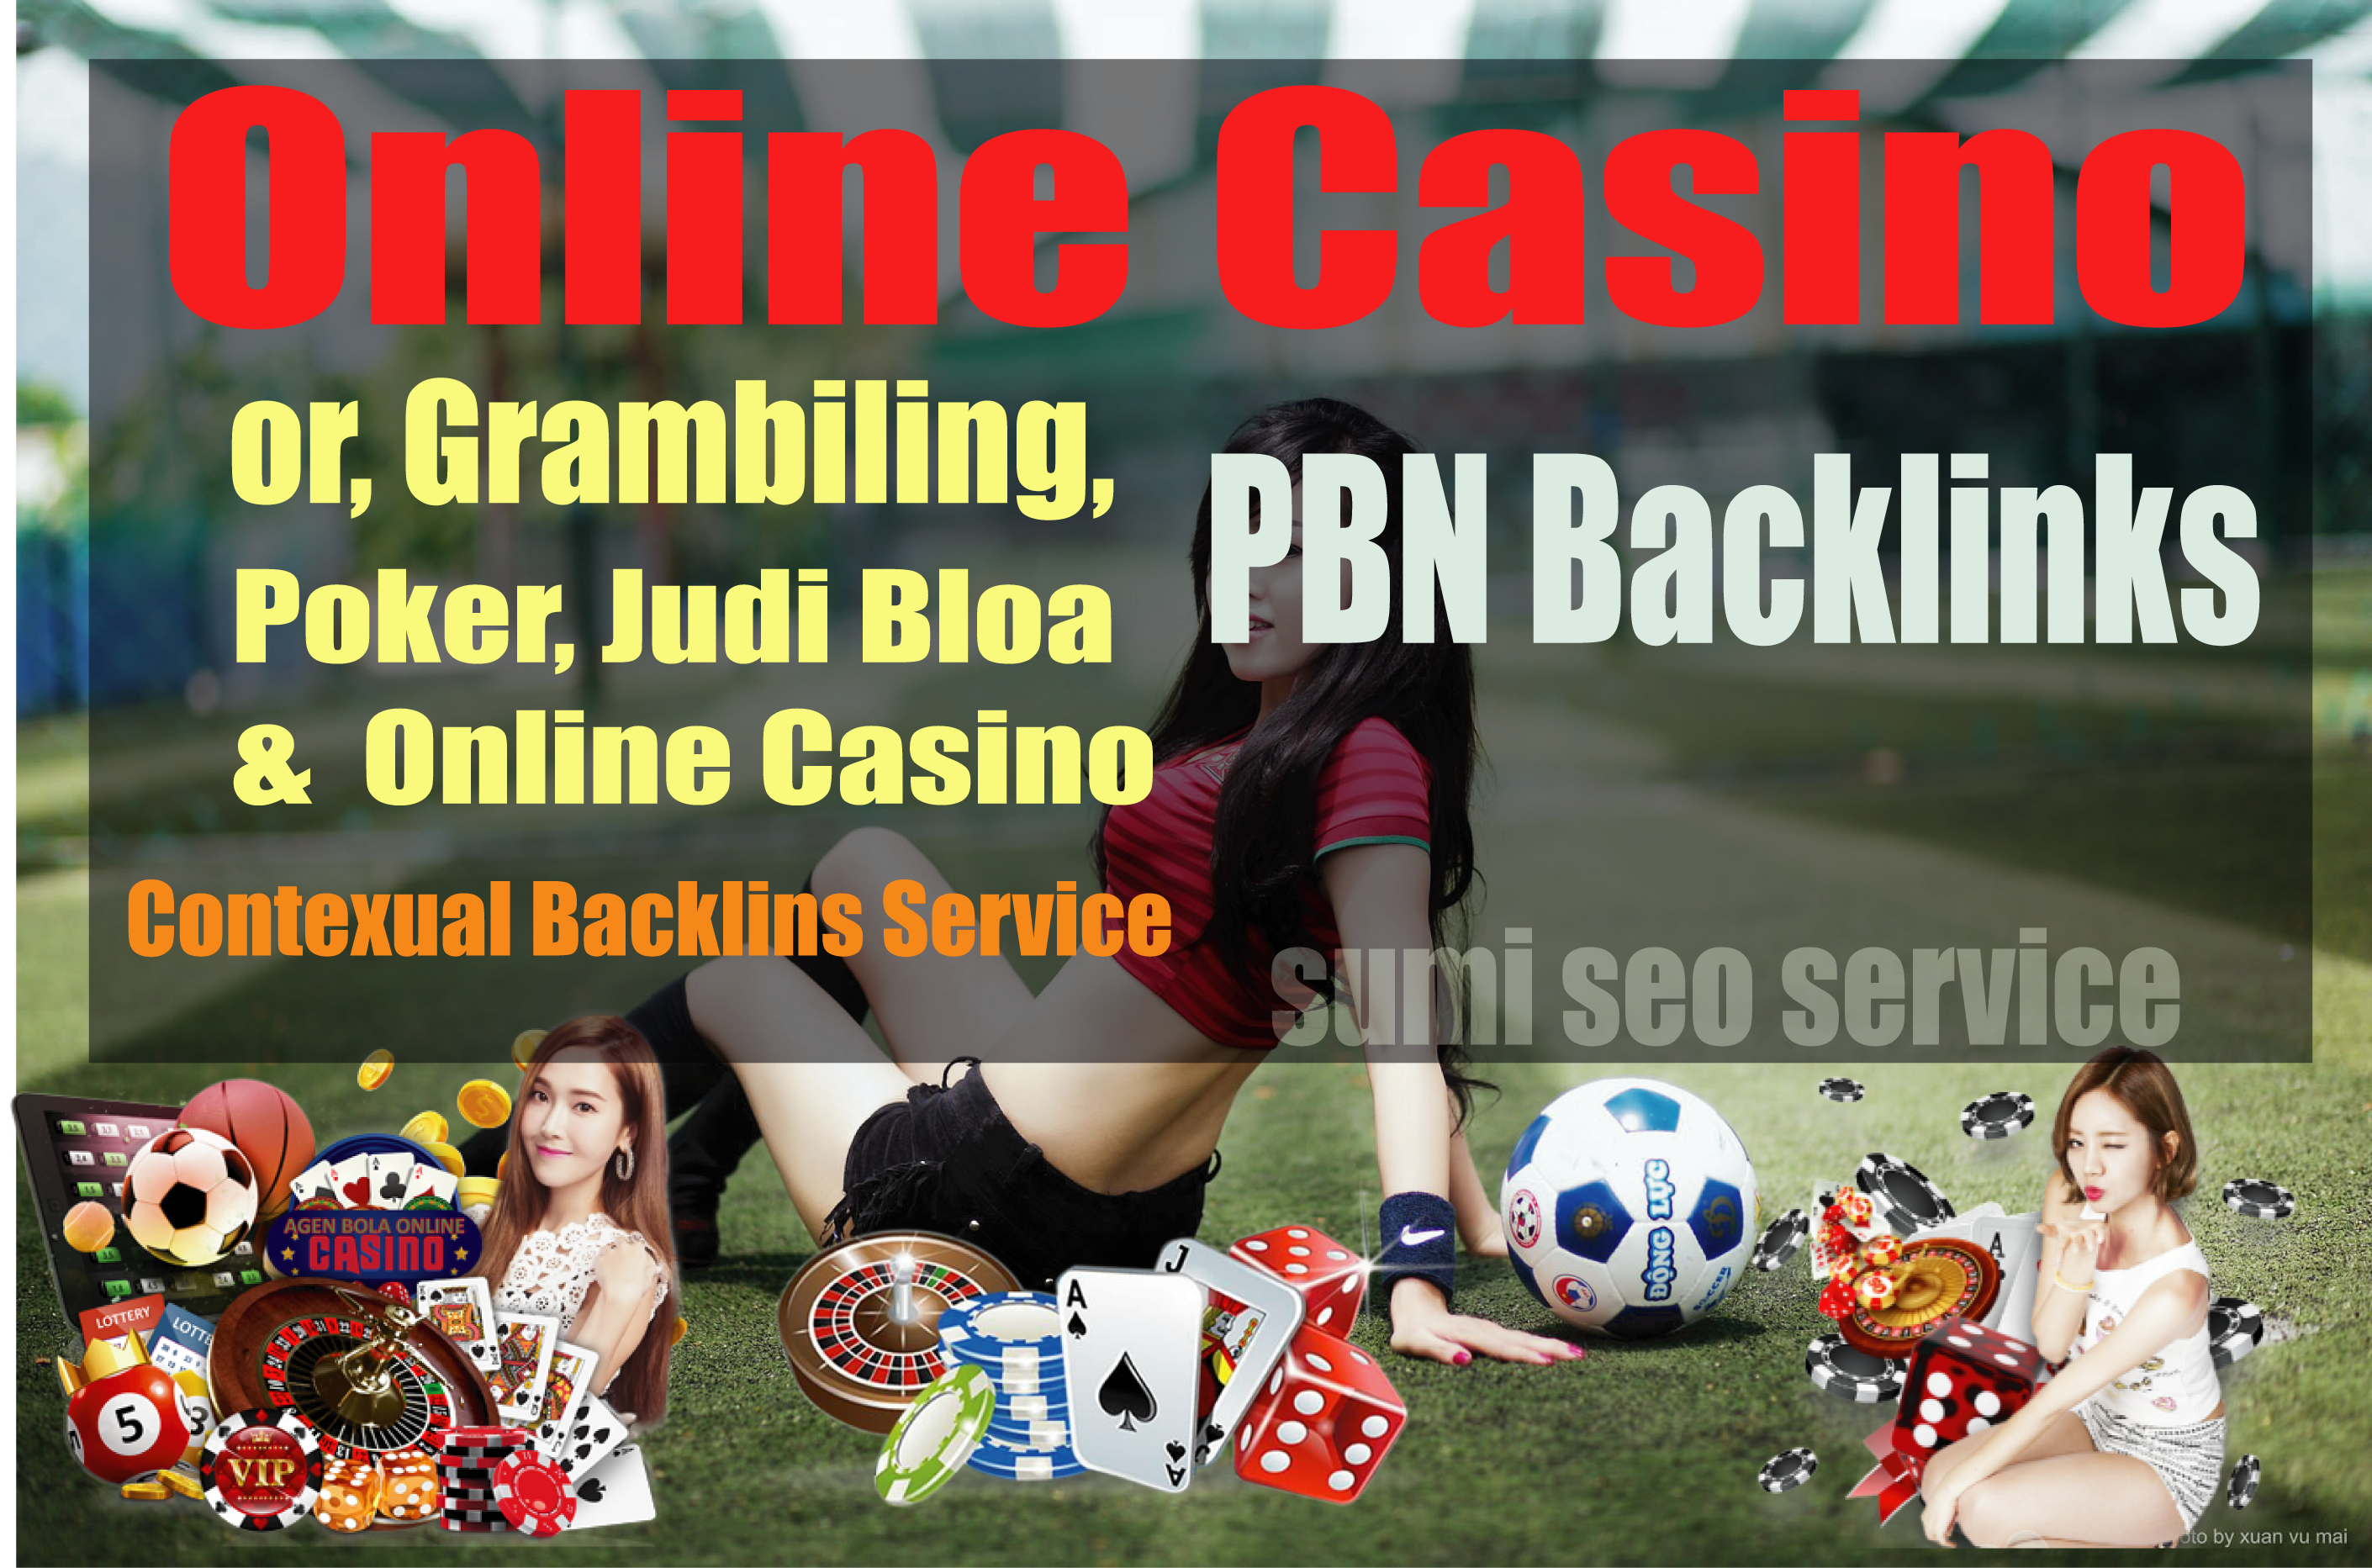 5 Casino Guest post- Casino / Gambling / Poker / Betting / sports sites